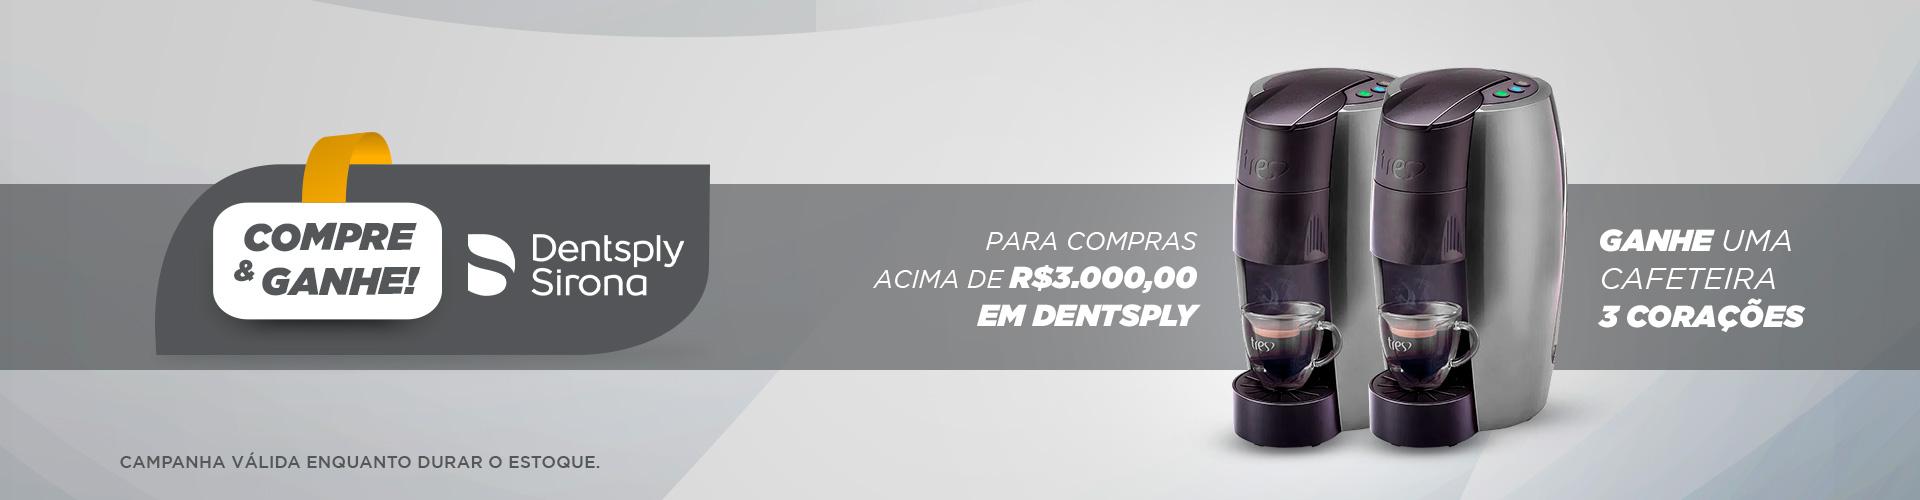 WEEK Dentsply 1 08